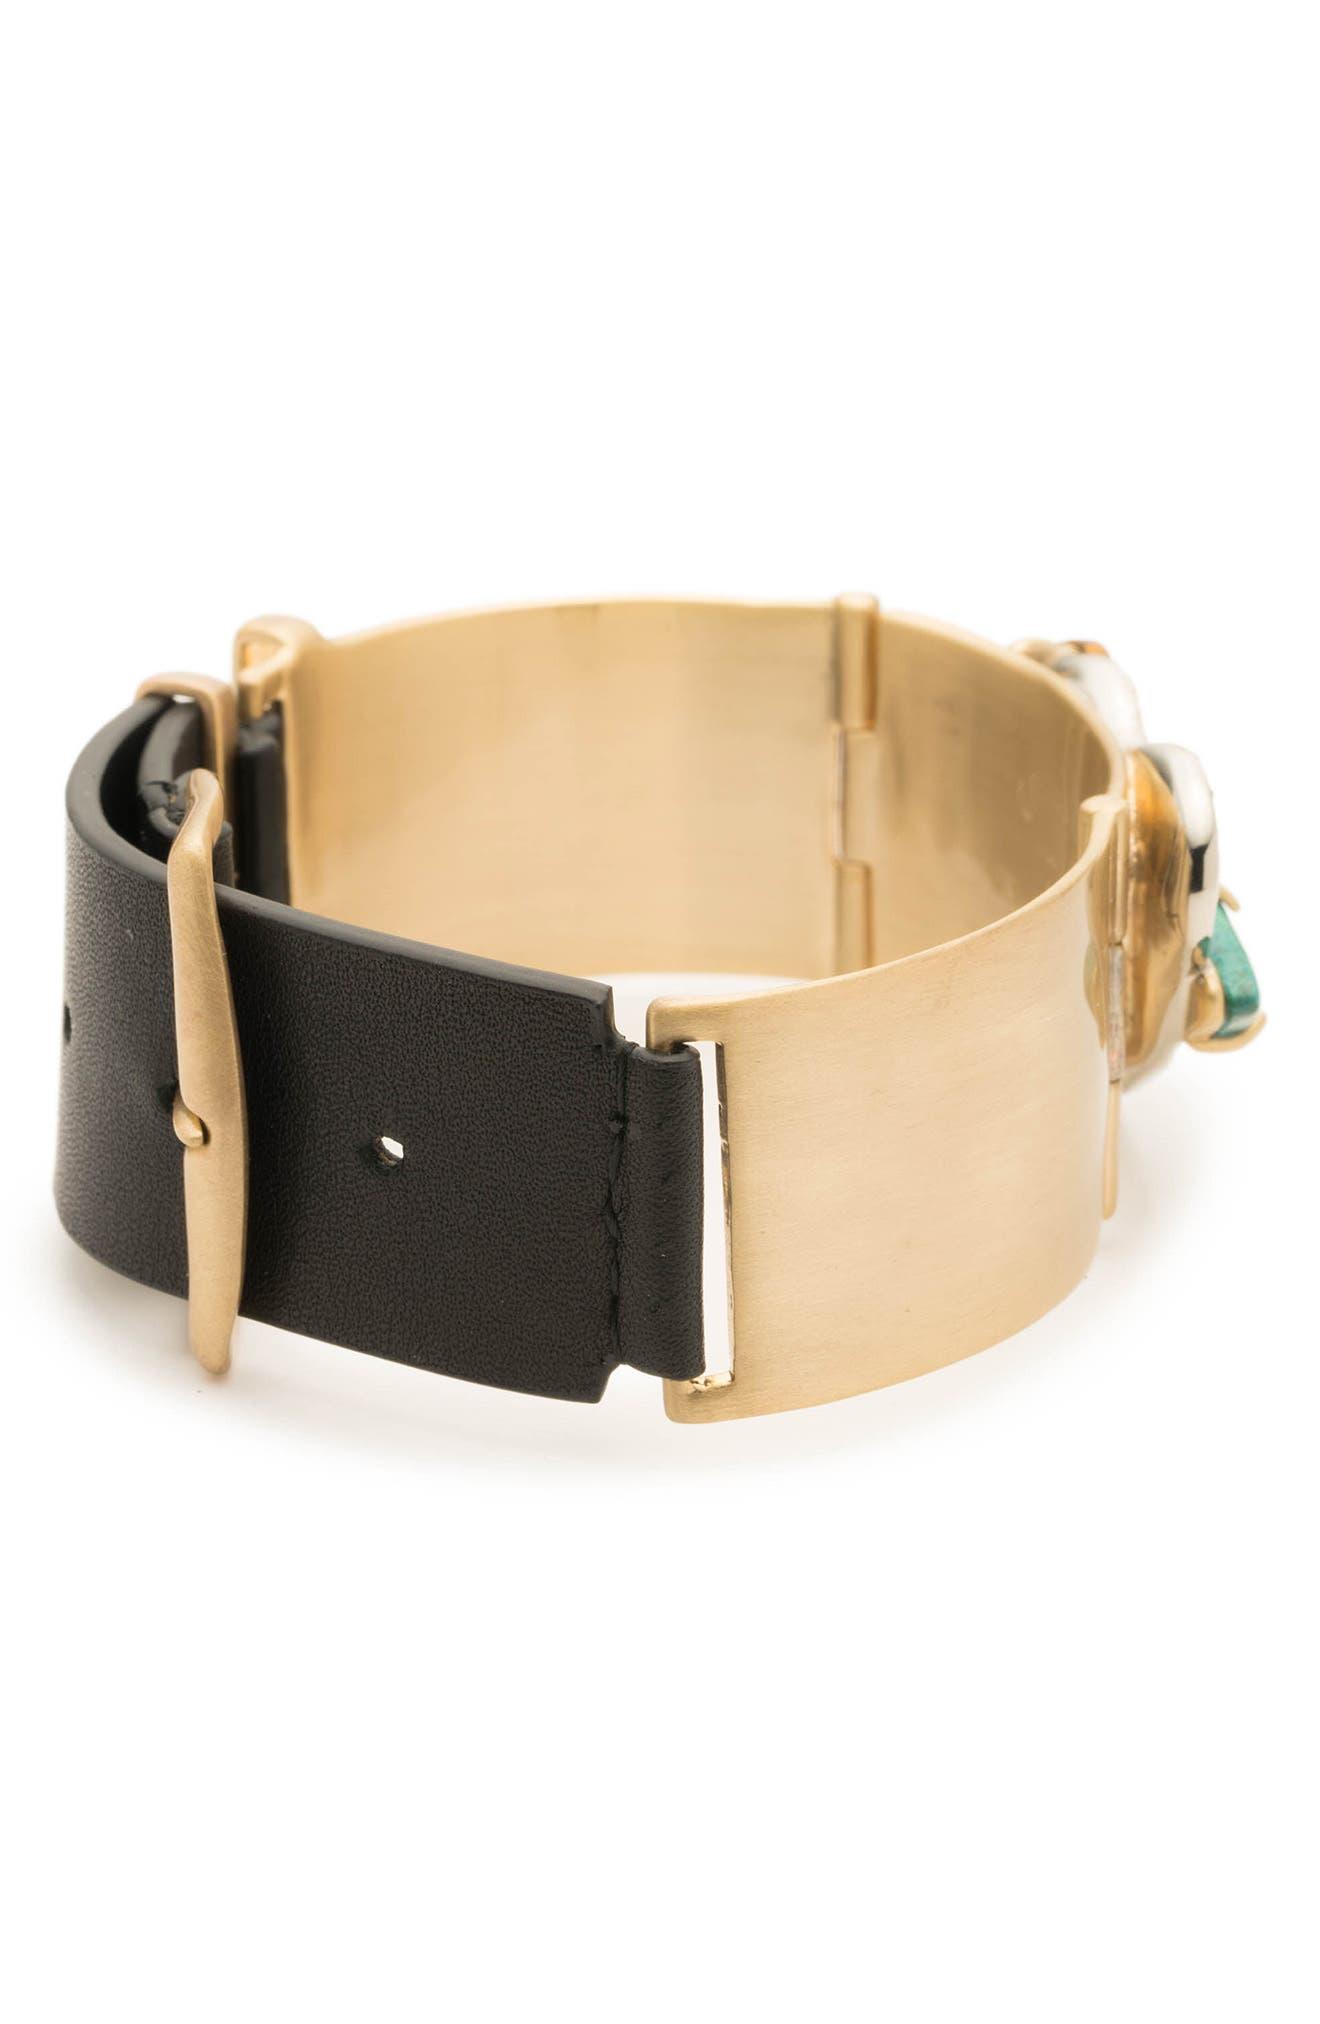 Crystal Encrusted Leather Strap Bracelet,                             Alternate thumbnail 4, color,                             GOLD/ SILVER